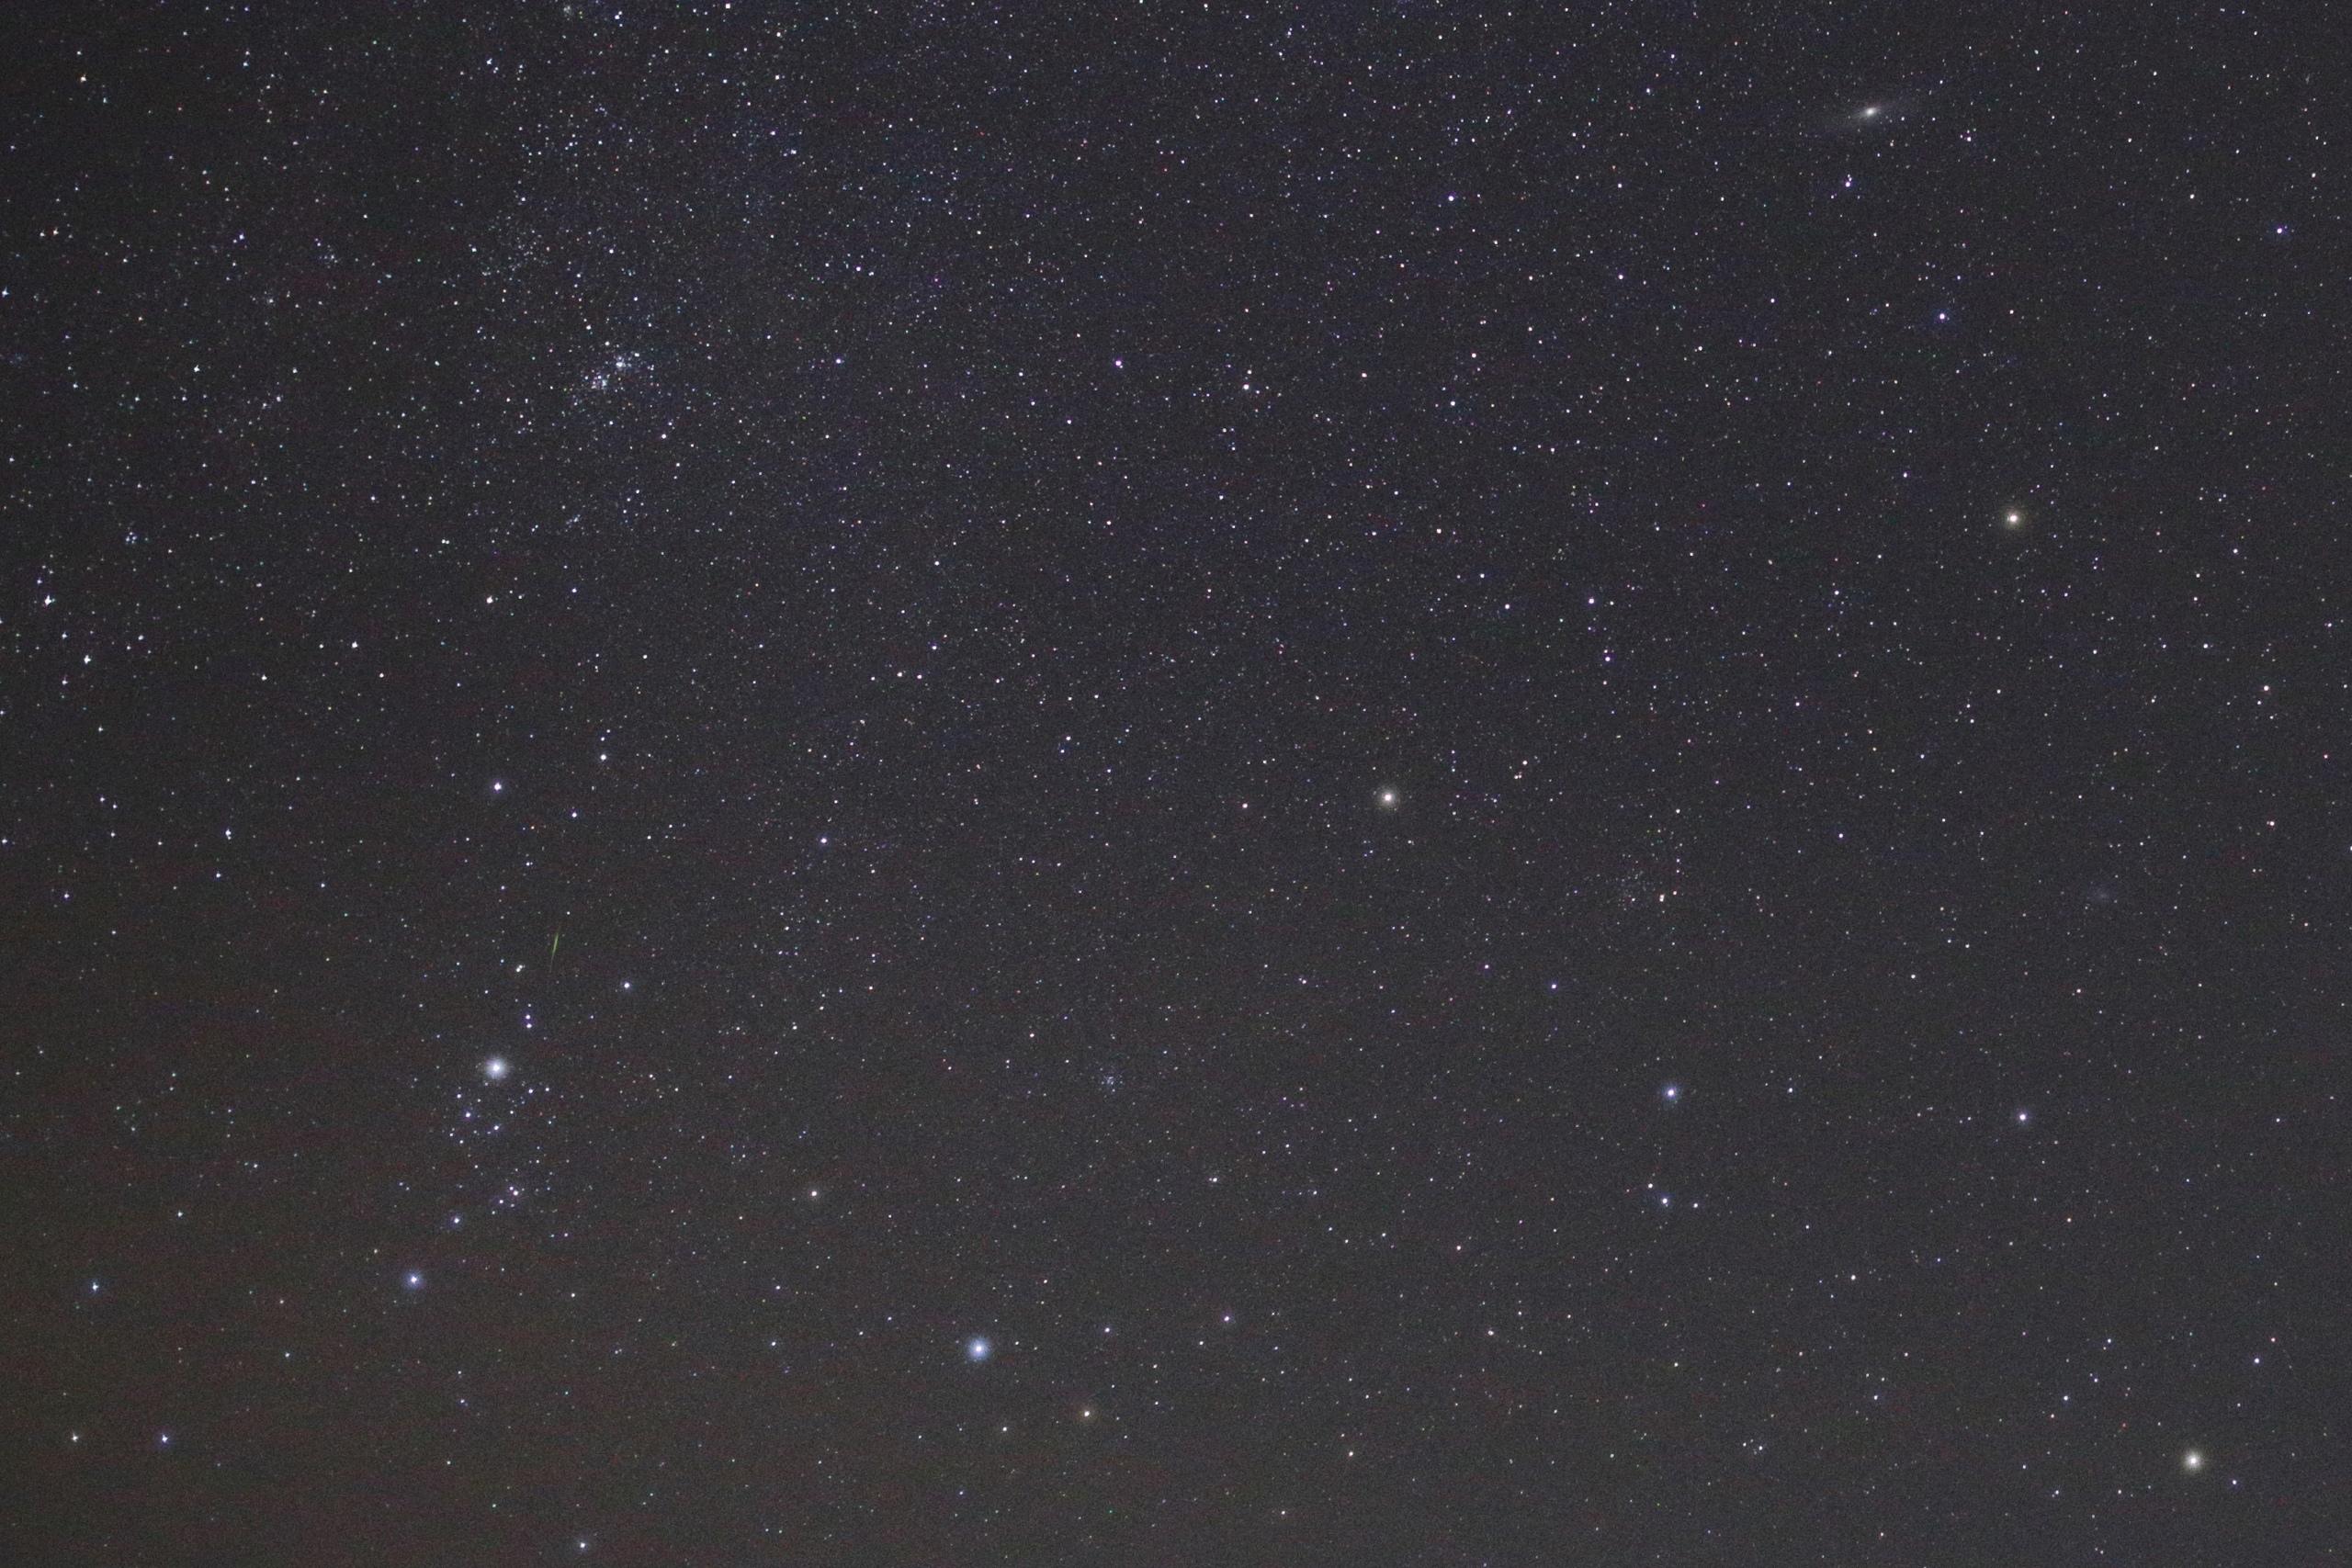 2 Поток метеоров над Астраханью сняли на фото